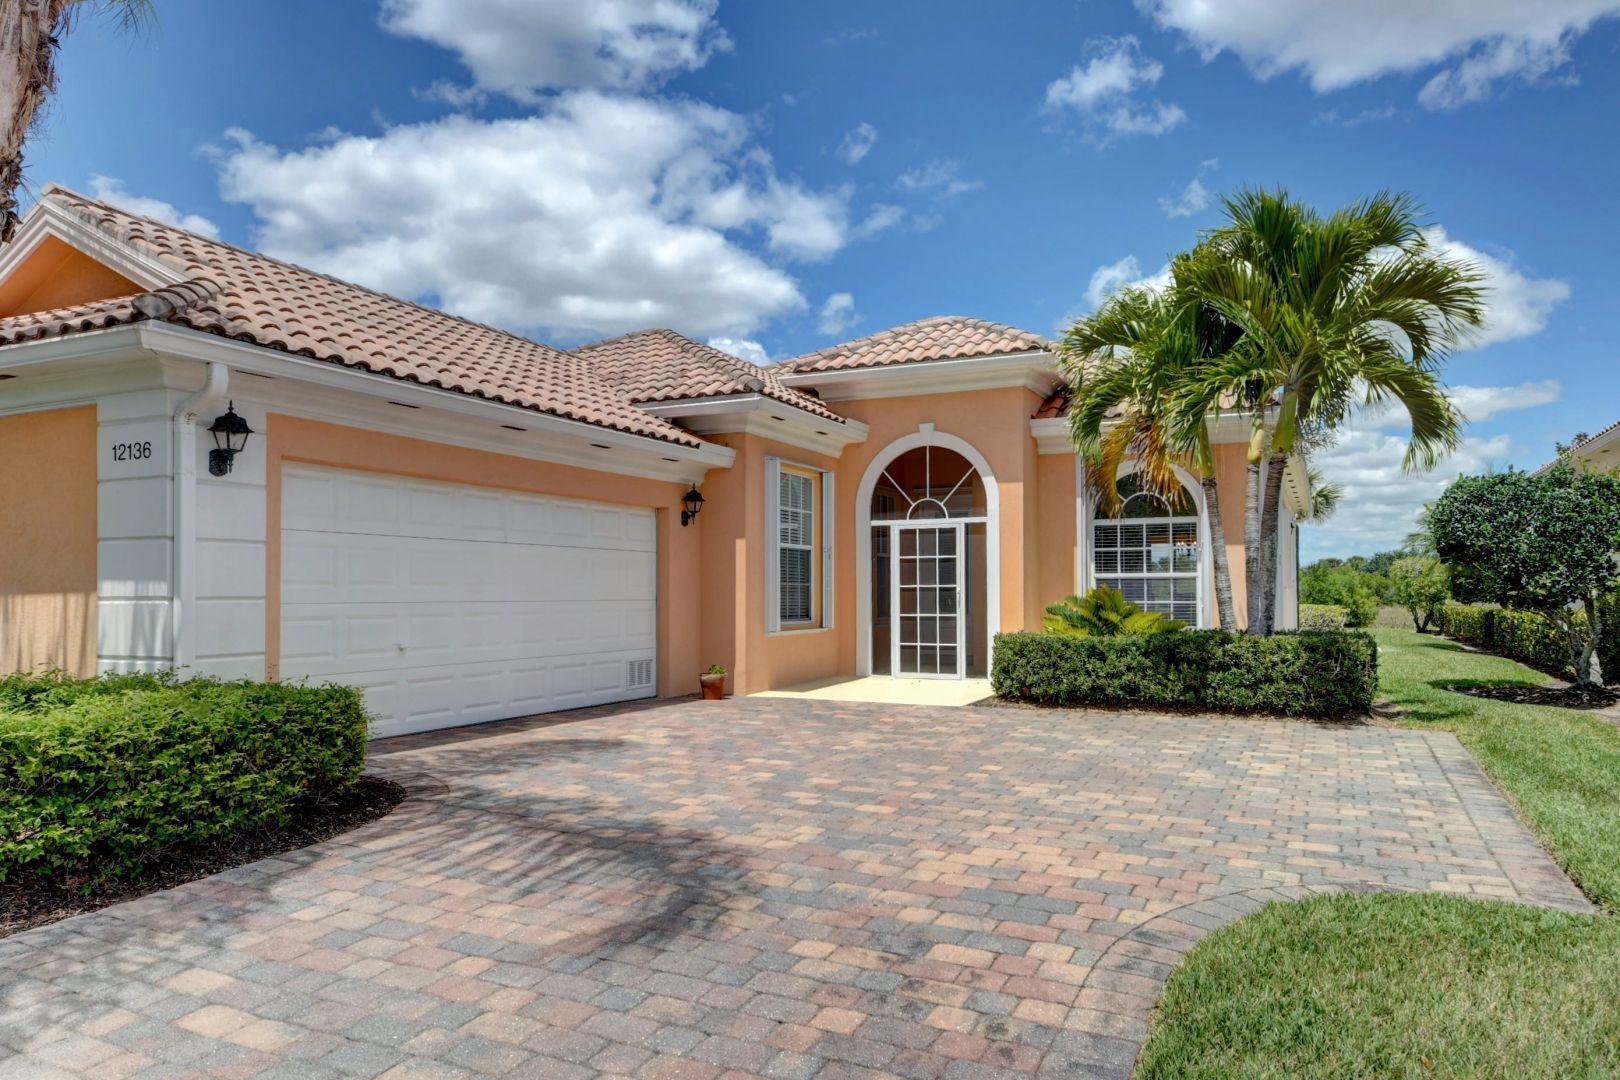 12136 Sw Keating Drive, Port Saint Lucie, FL 34987